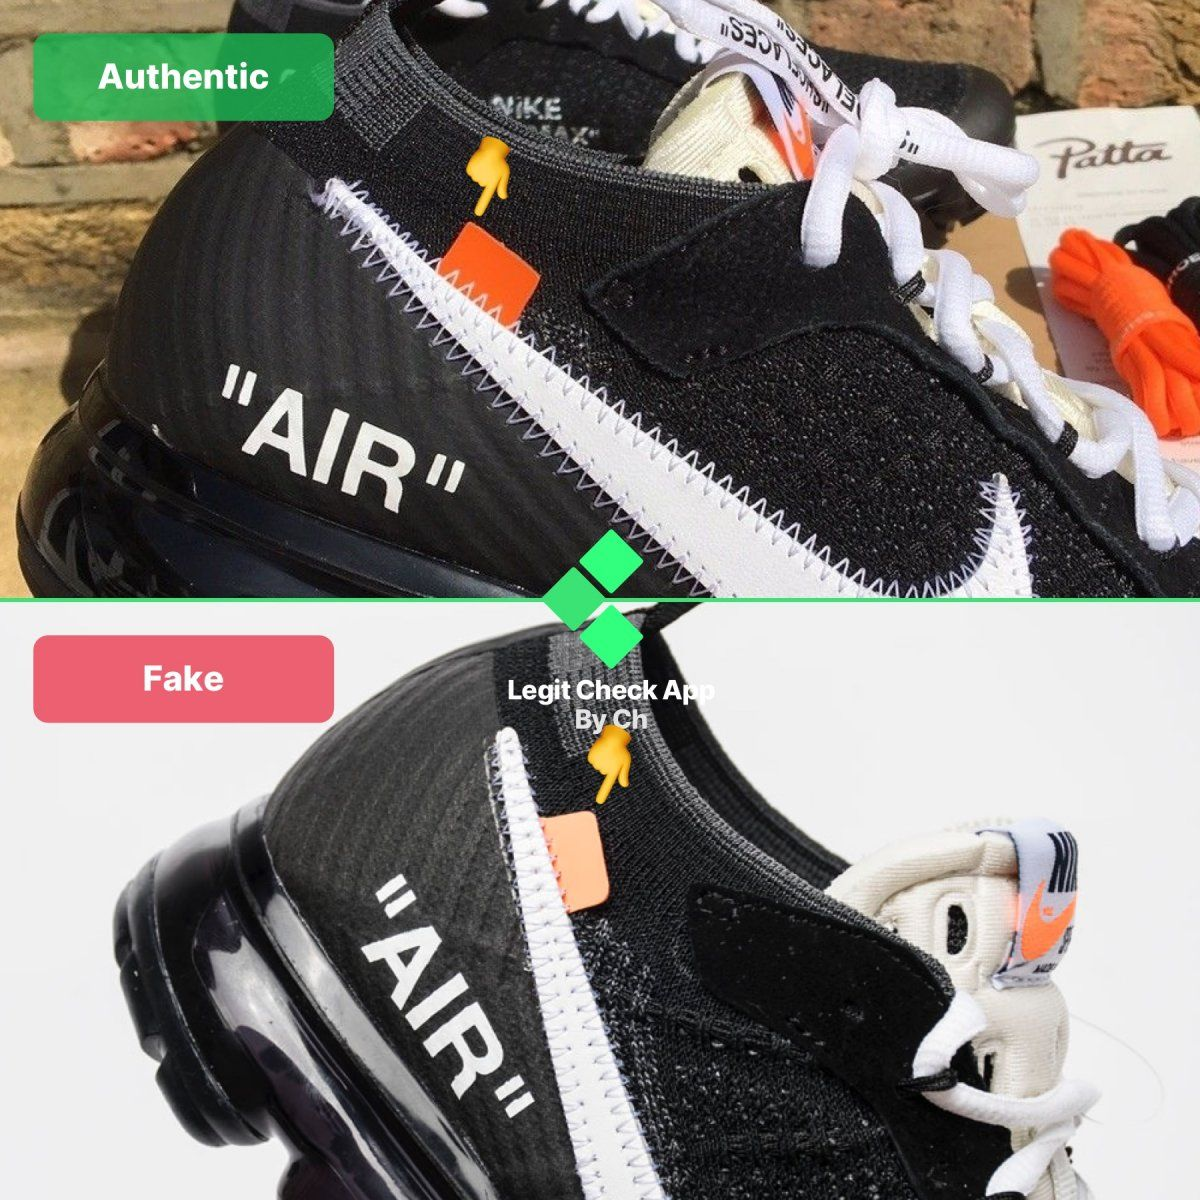 Fake shoes